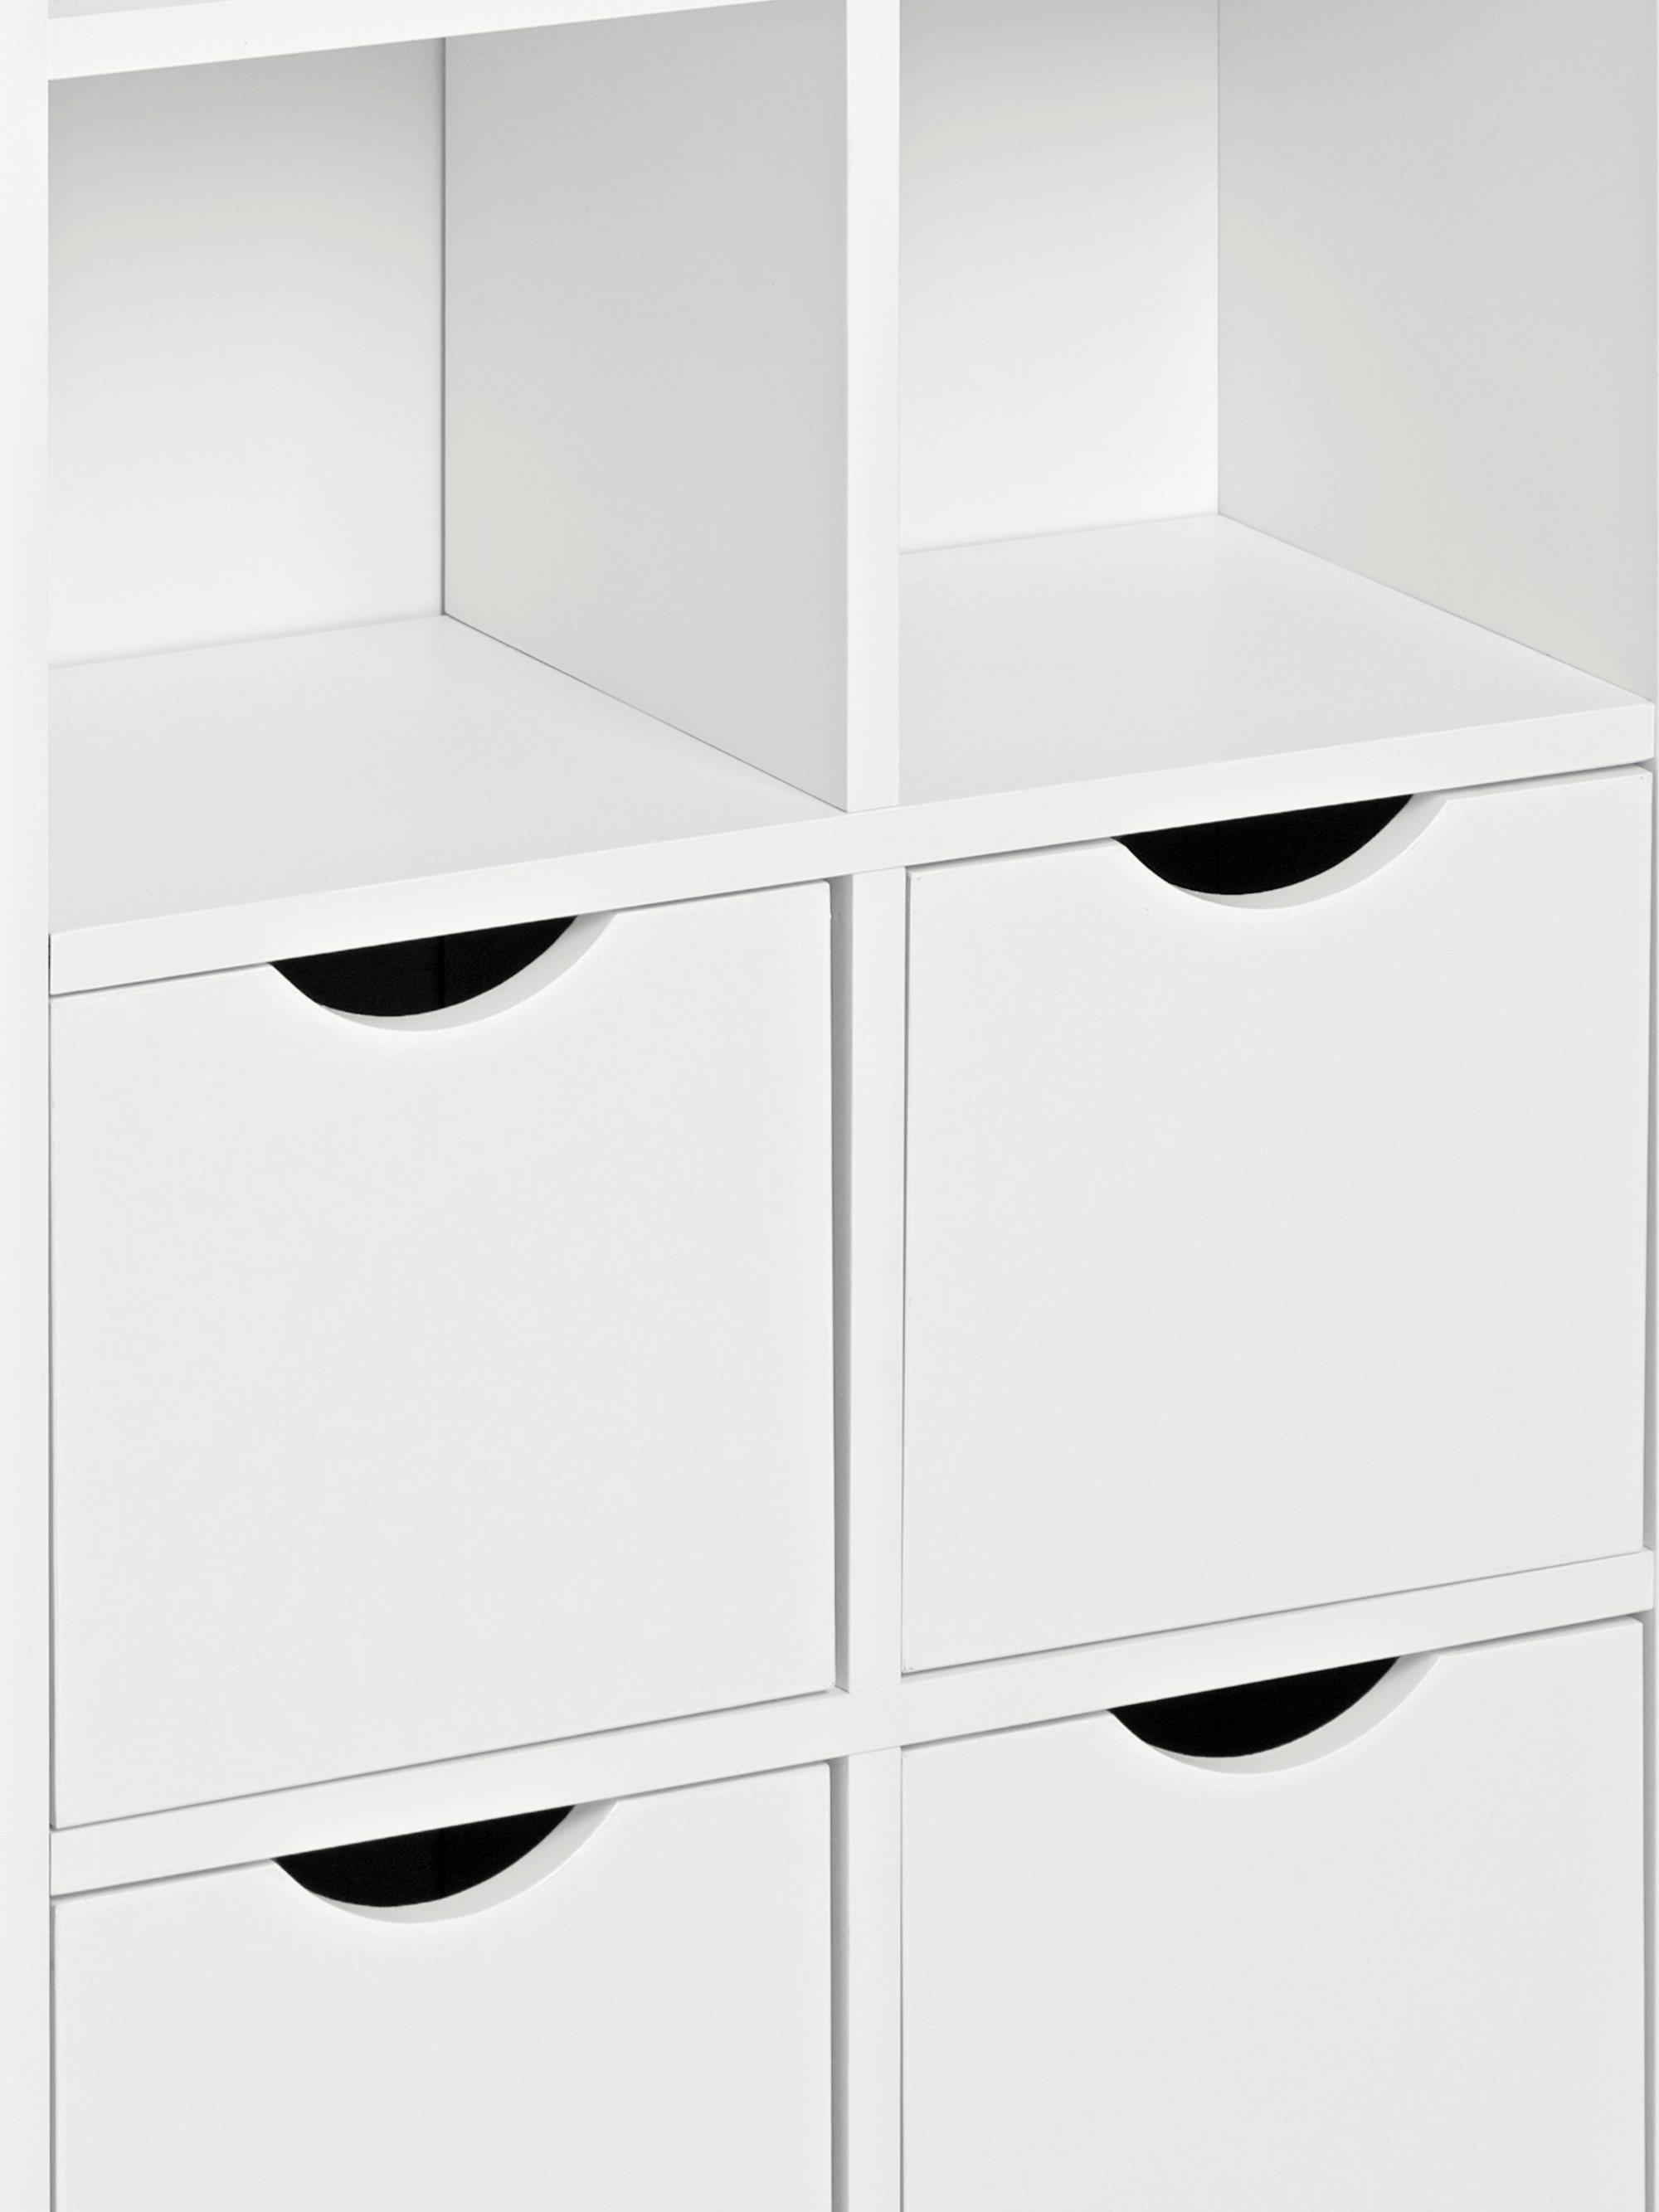 dvd regal kaufen great husliche dvd regal eiche massiv solid oak wooden dvd cd shelf with jpg x. Black Bedroom Furniture Sets. Home Design Ideas